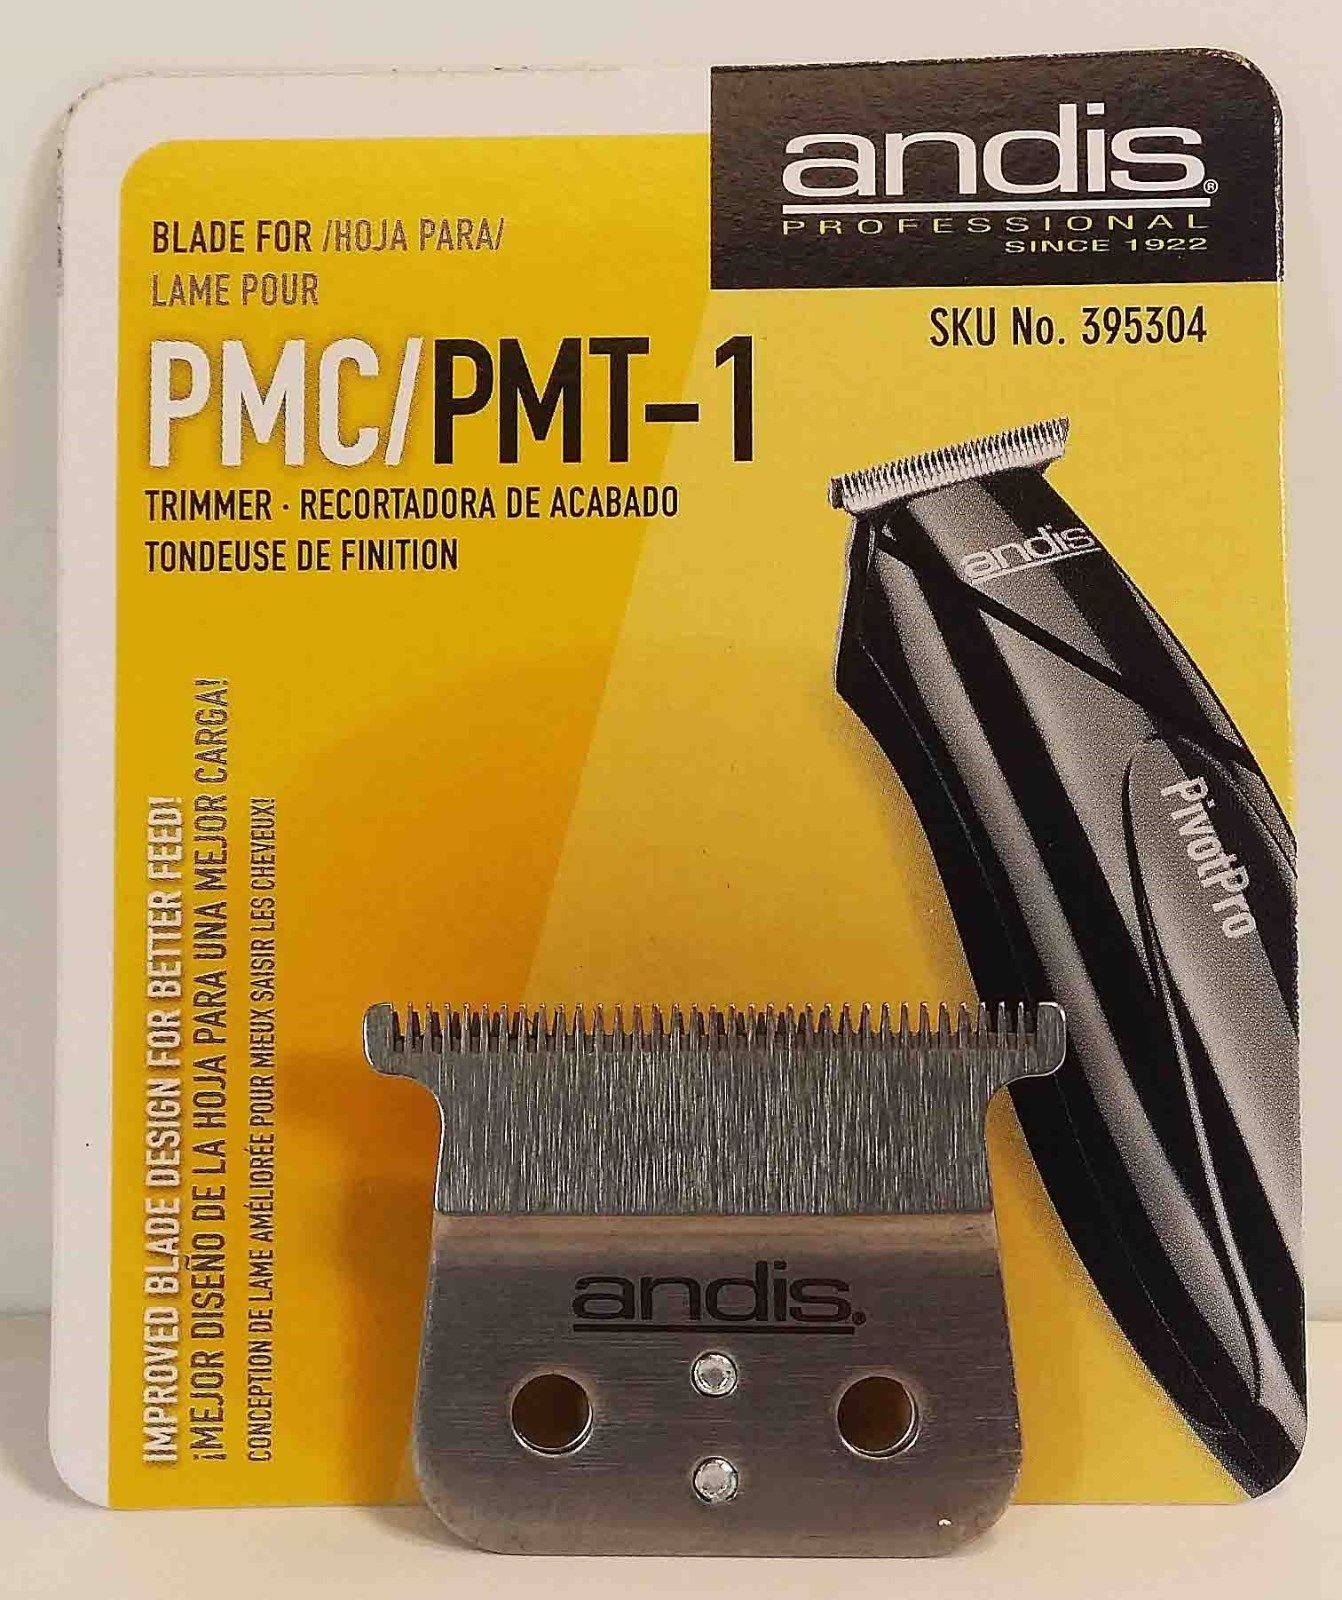 Cuchillas : Andis 23570 Pmc/pmt-1 Reemplazo